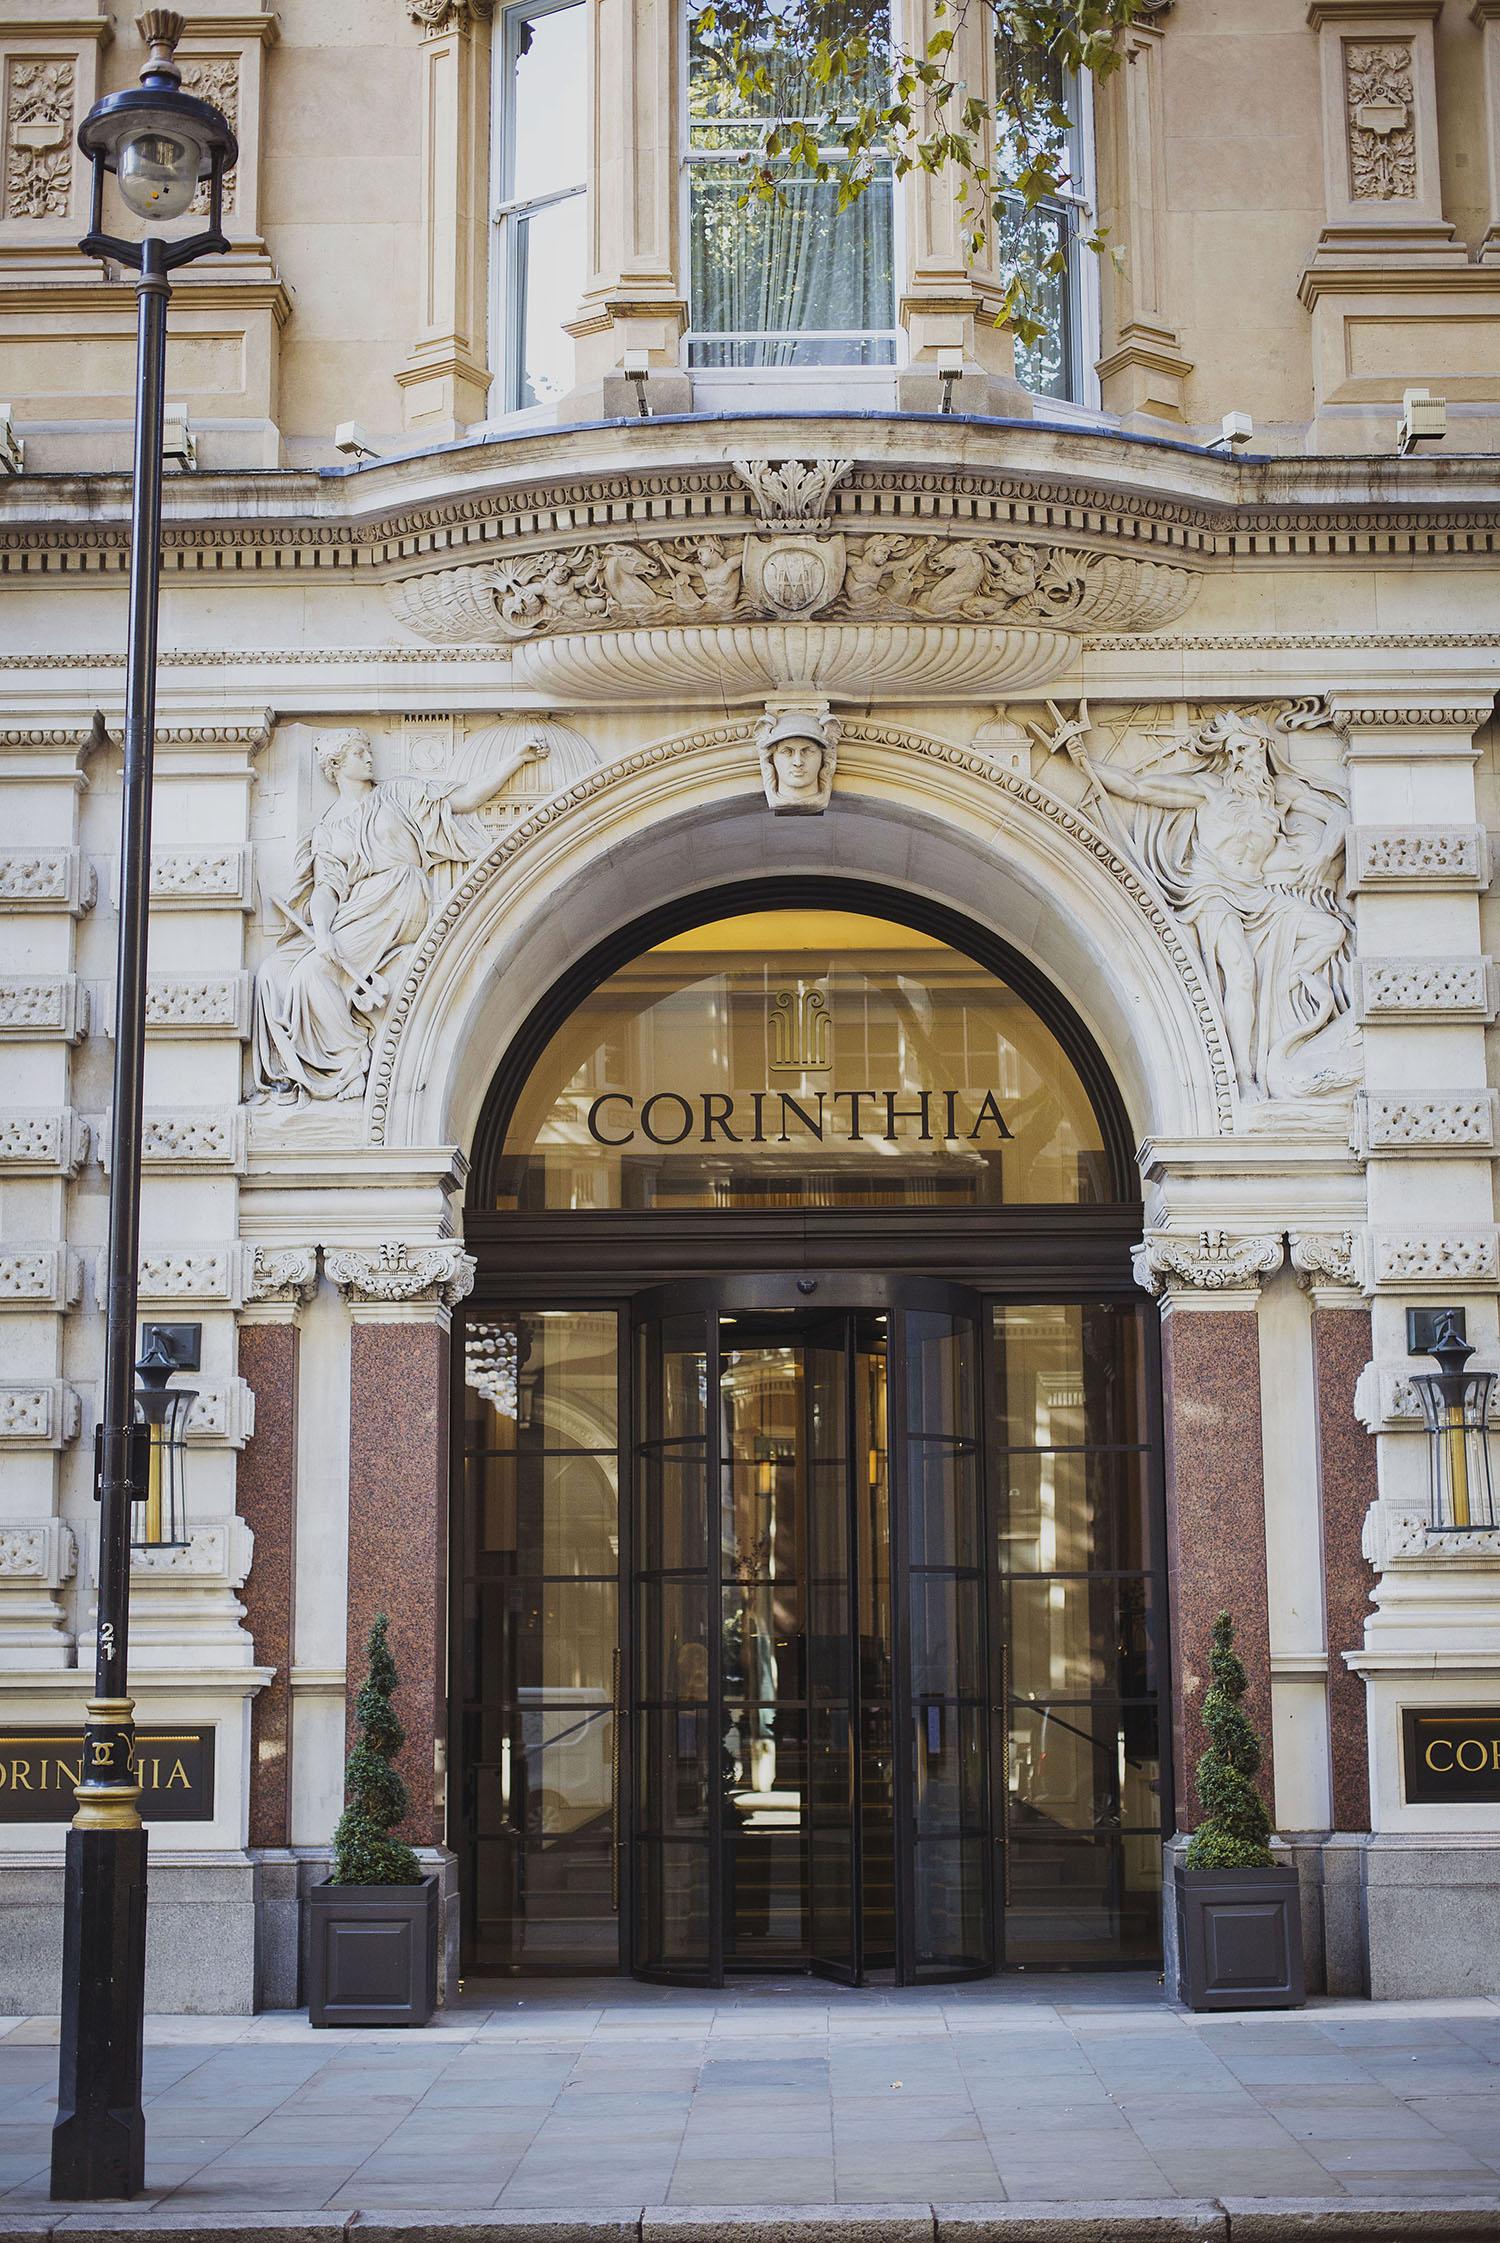 Corinthia hotel entrance Corinthia hotel wedding photographer